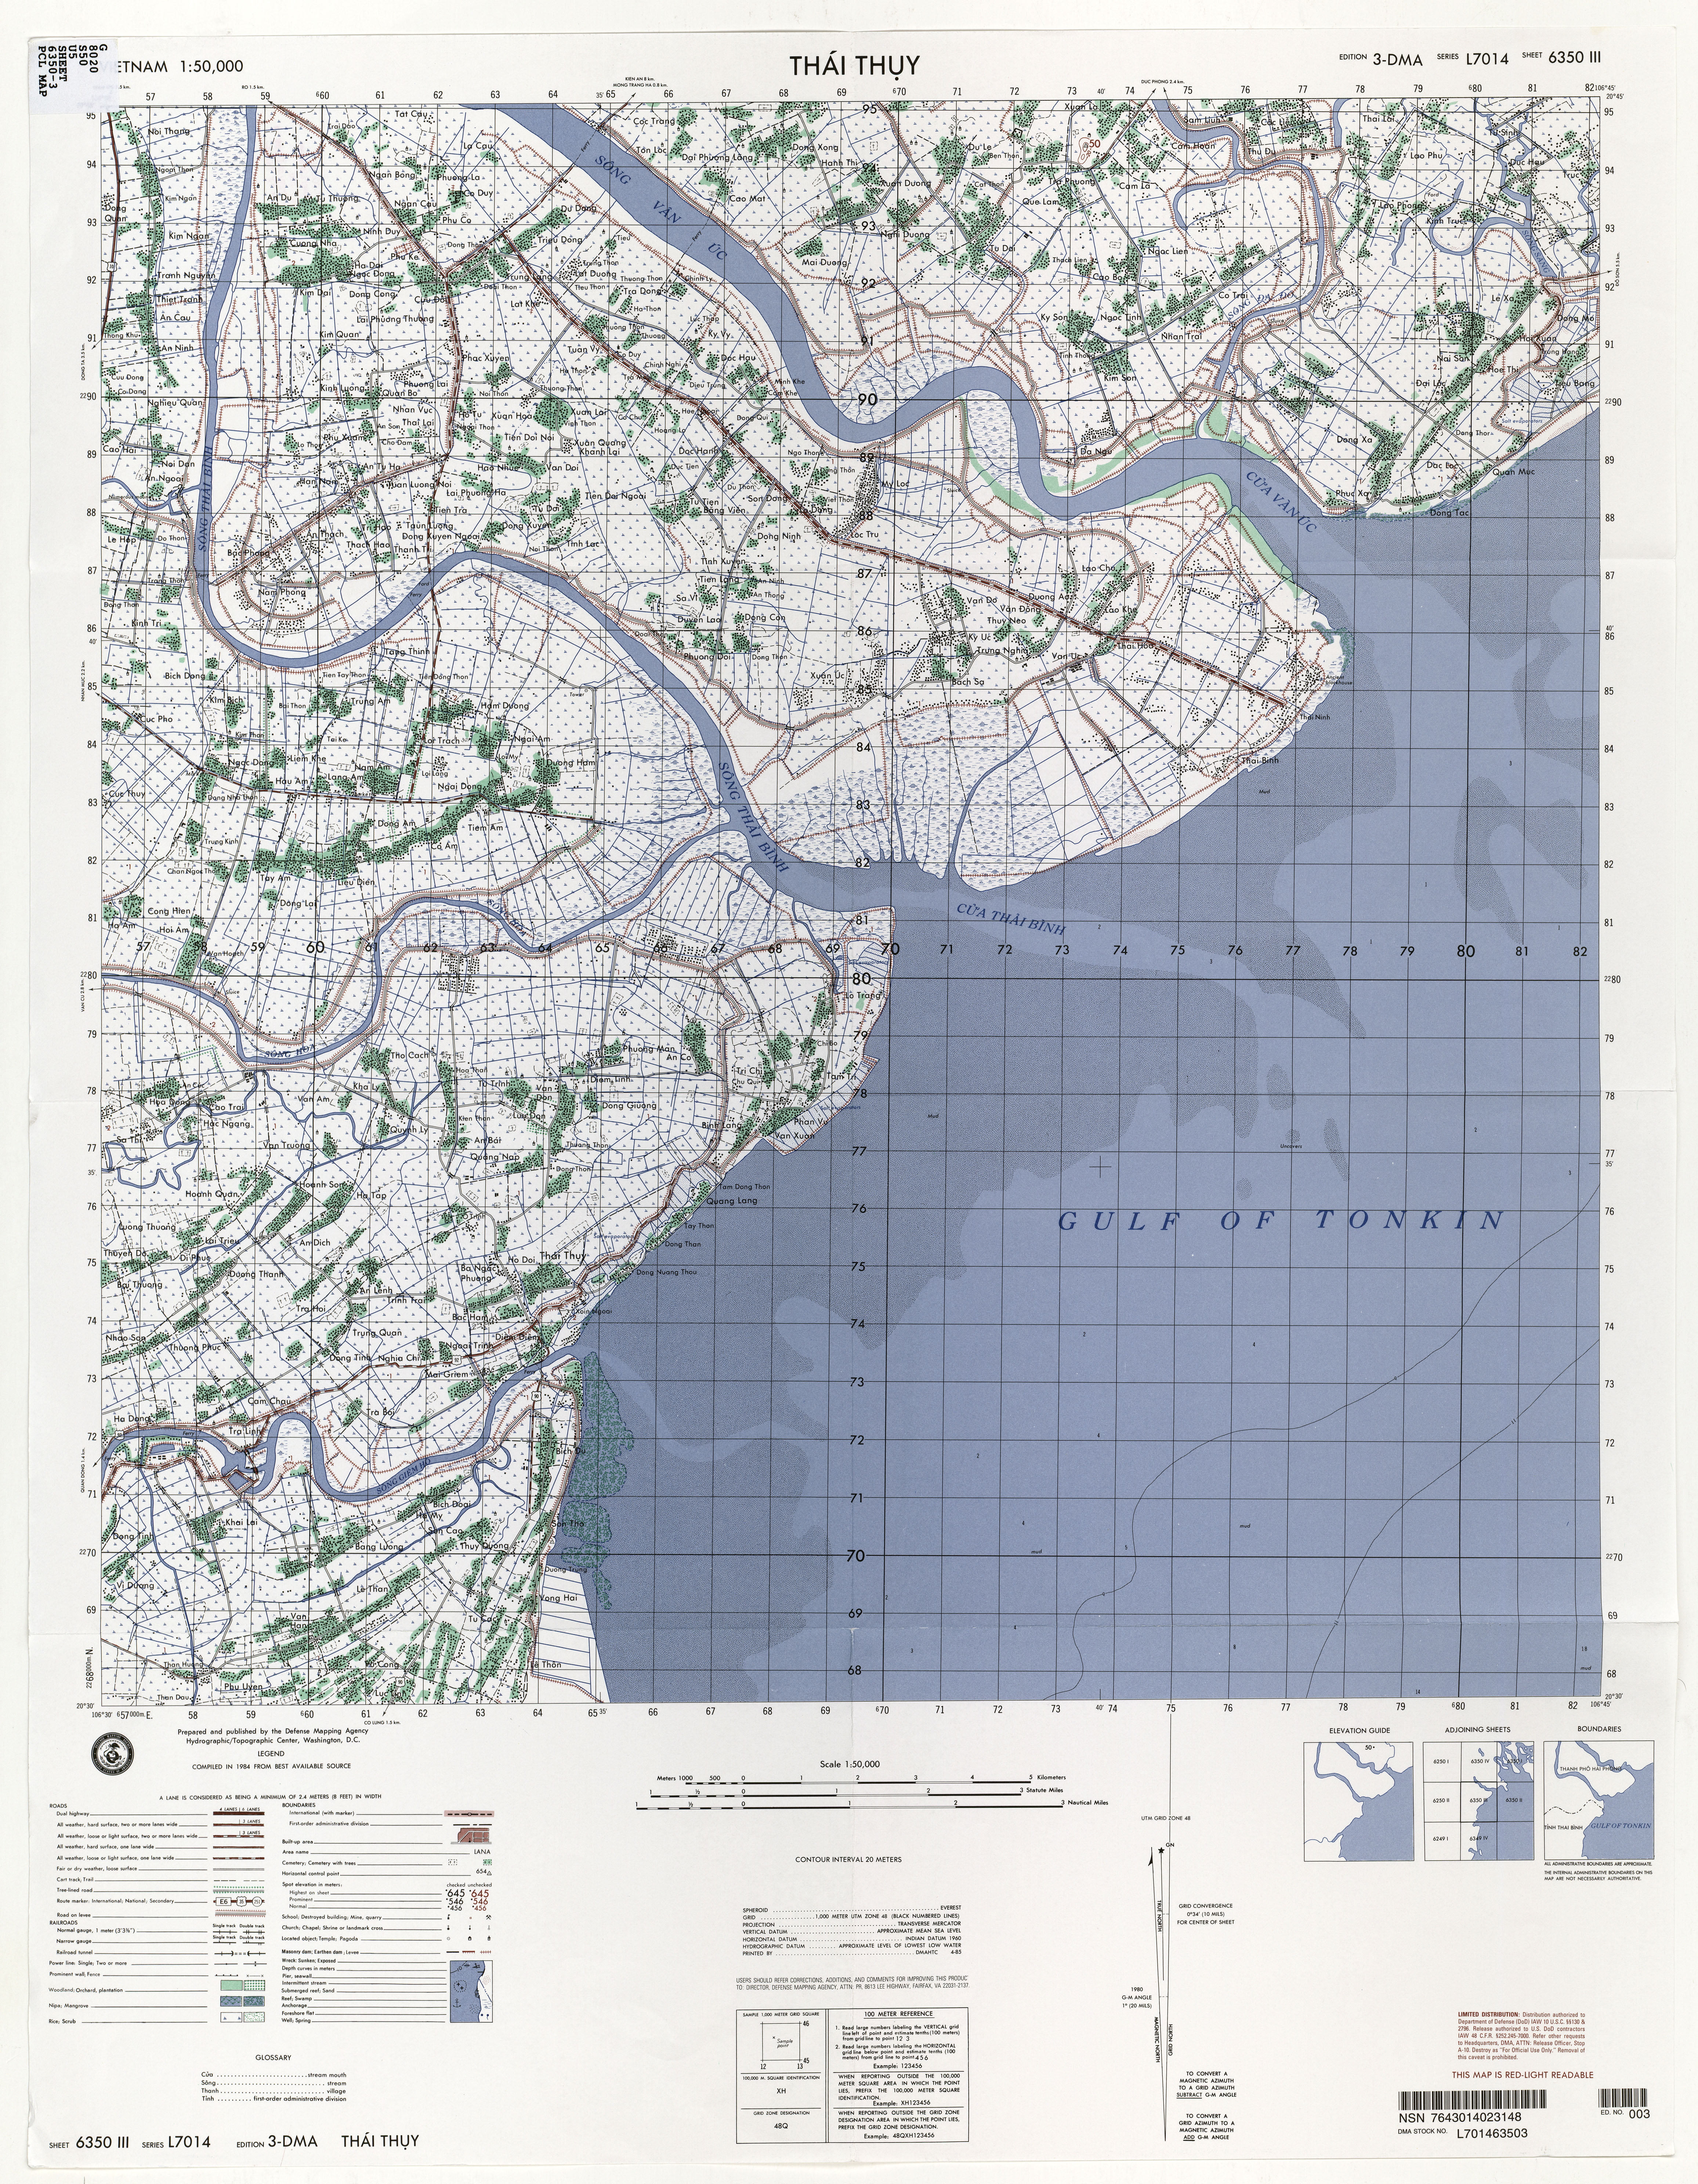 Topographic Sheet 6350 3 1 50 000 U S Defense Mapping Agency 1984 8 7mb Jpeg